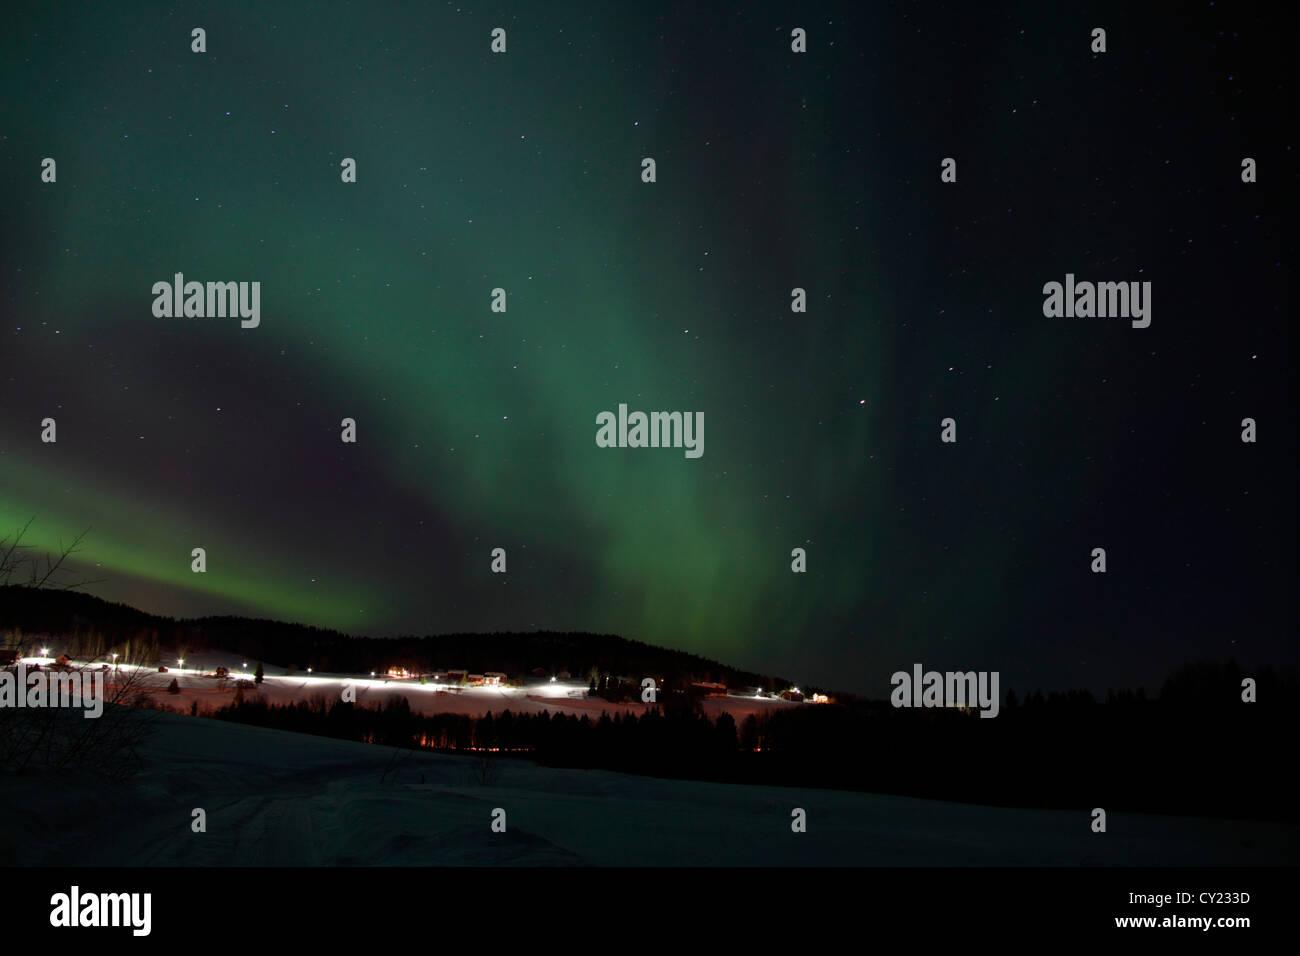 Northern lights shine over a village in northern Sweden. - Stock Image